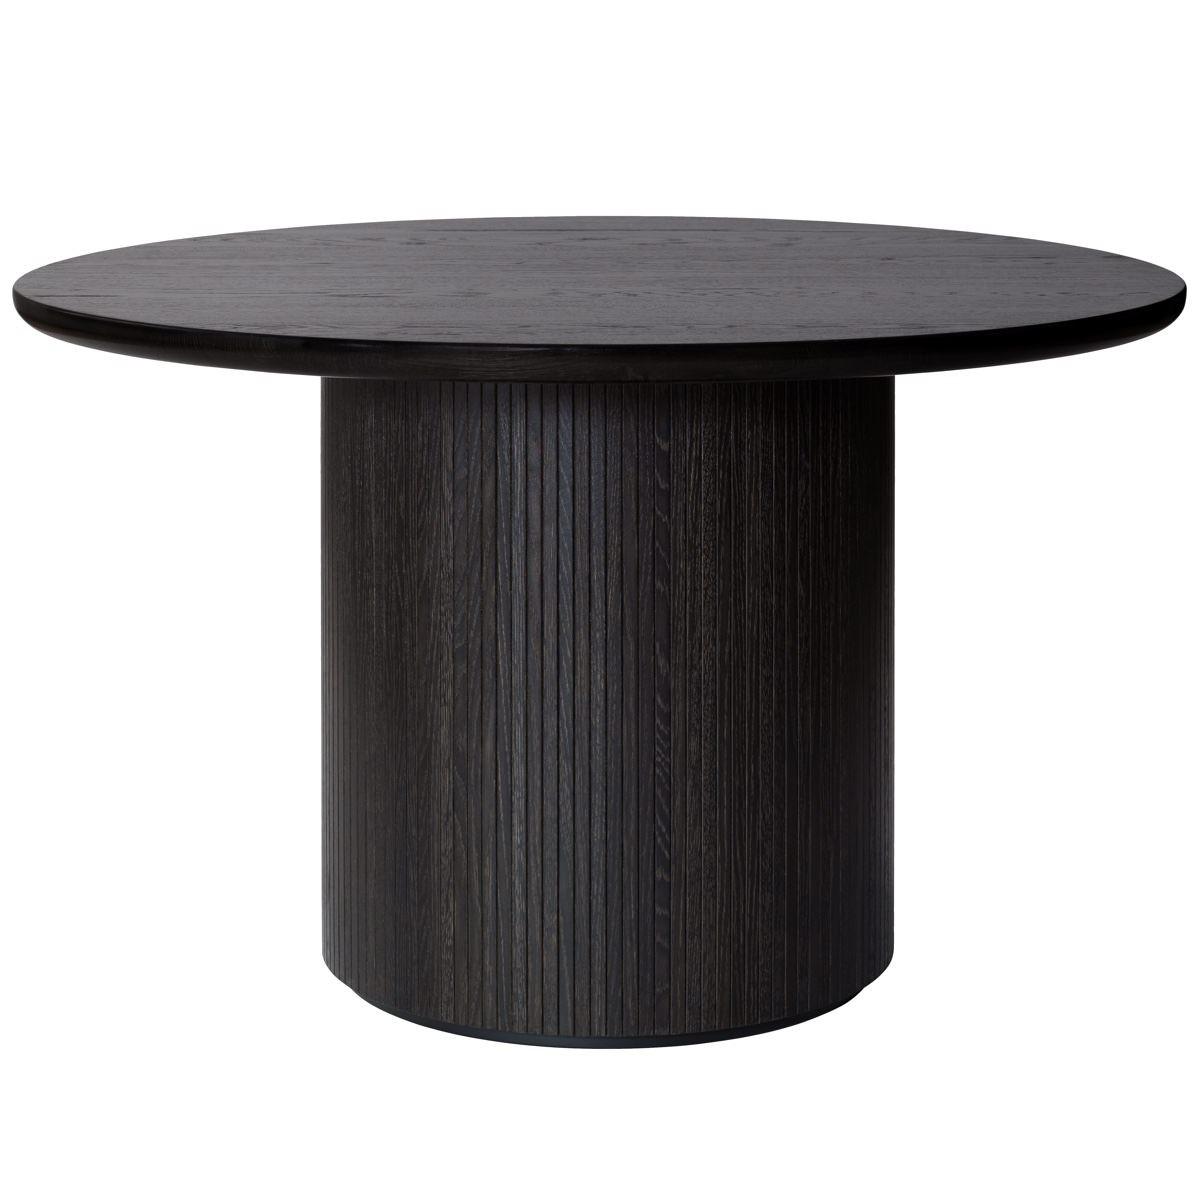 Gubi Moon Table - 120cm